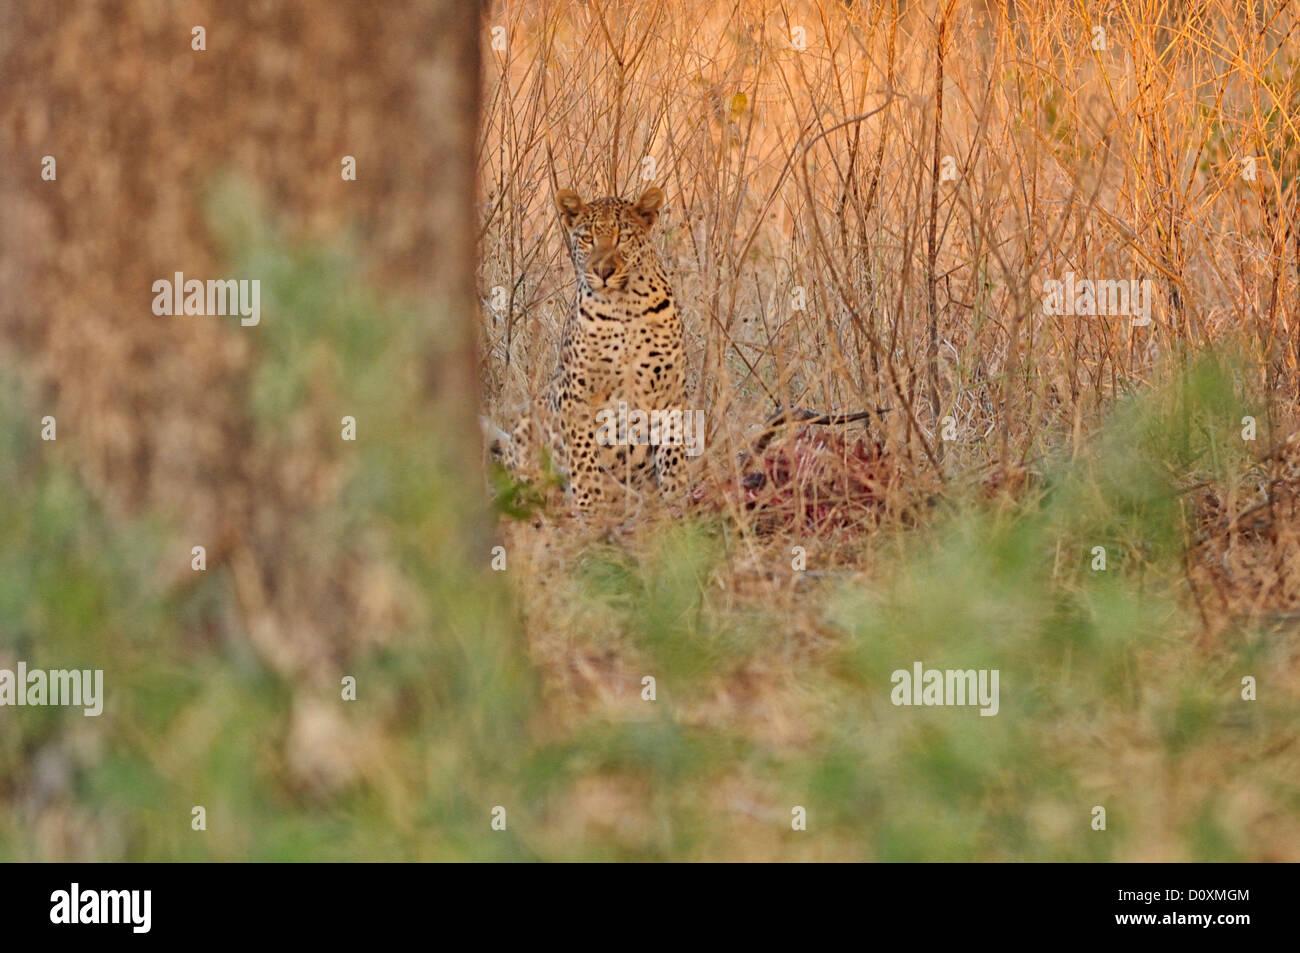 Africa, Botswana, Chobe, National Park, Leopard, animal, cat, wildlife, wild, wildlife - Stock Image